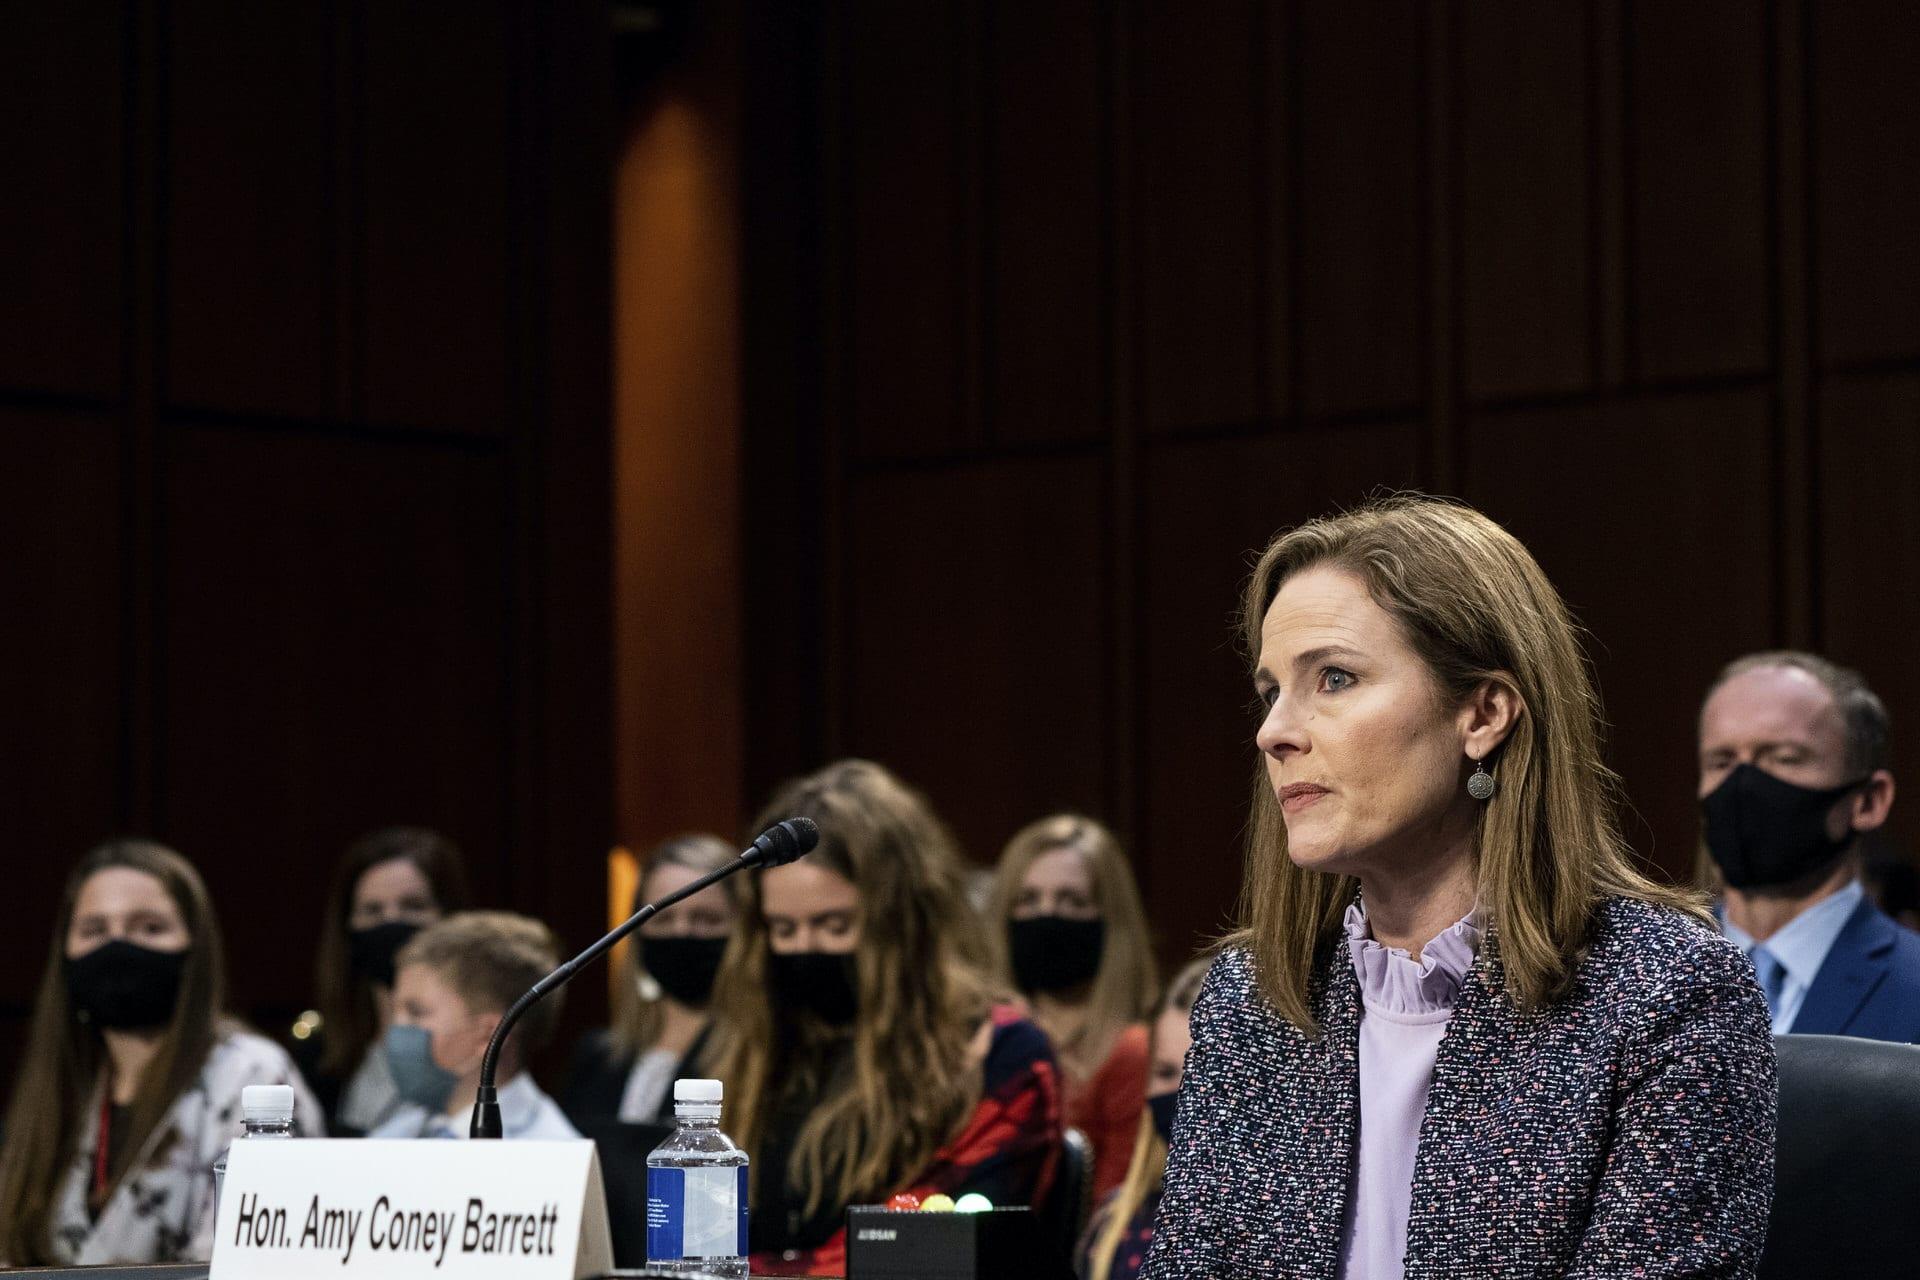 Advocates say Amy Coney Barrett could undercut efforts to curb sexual assault